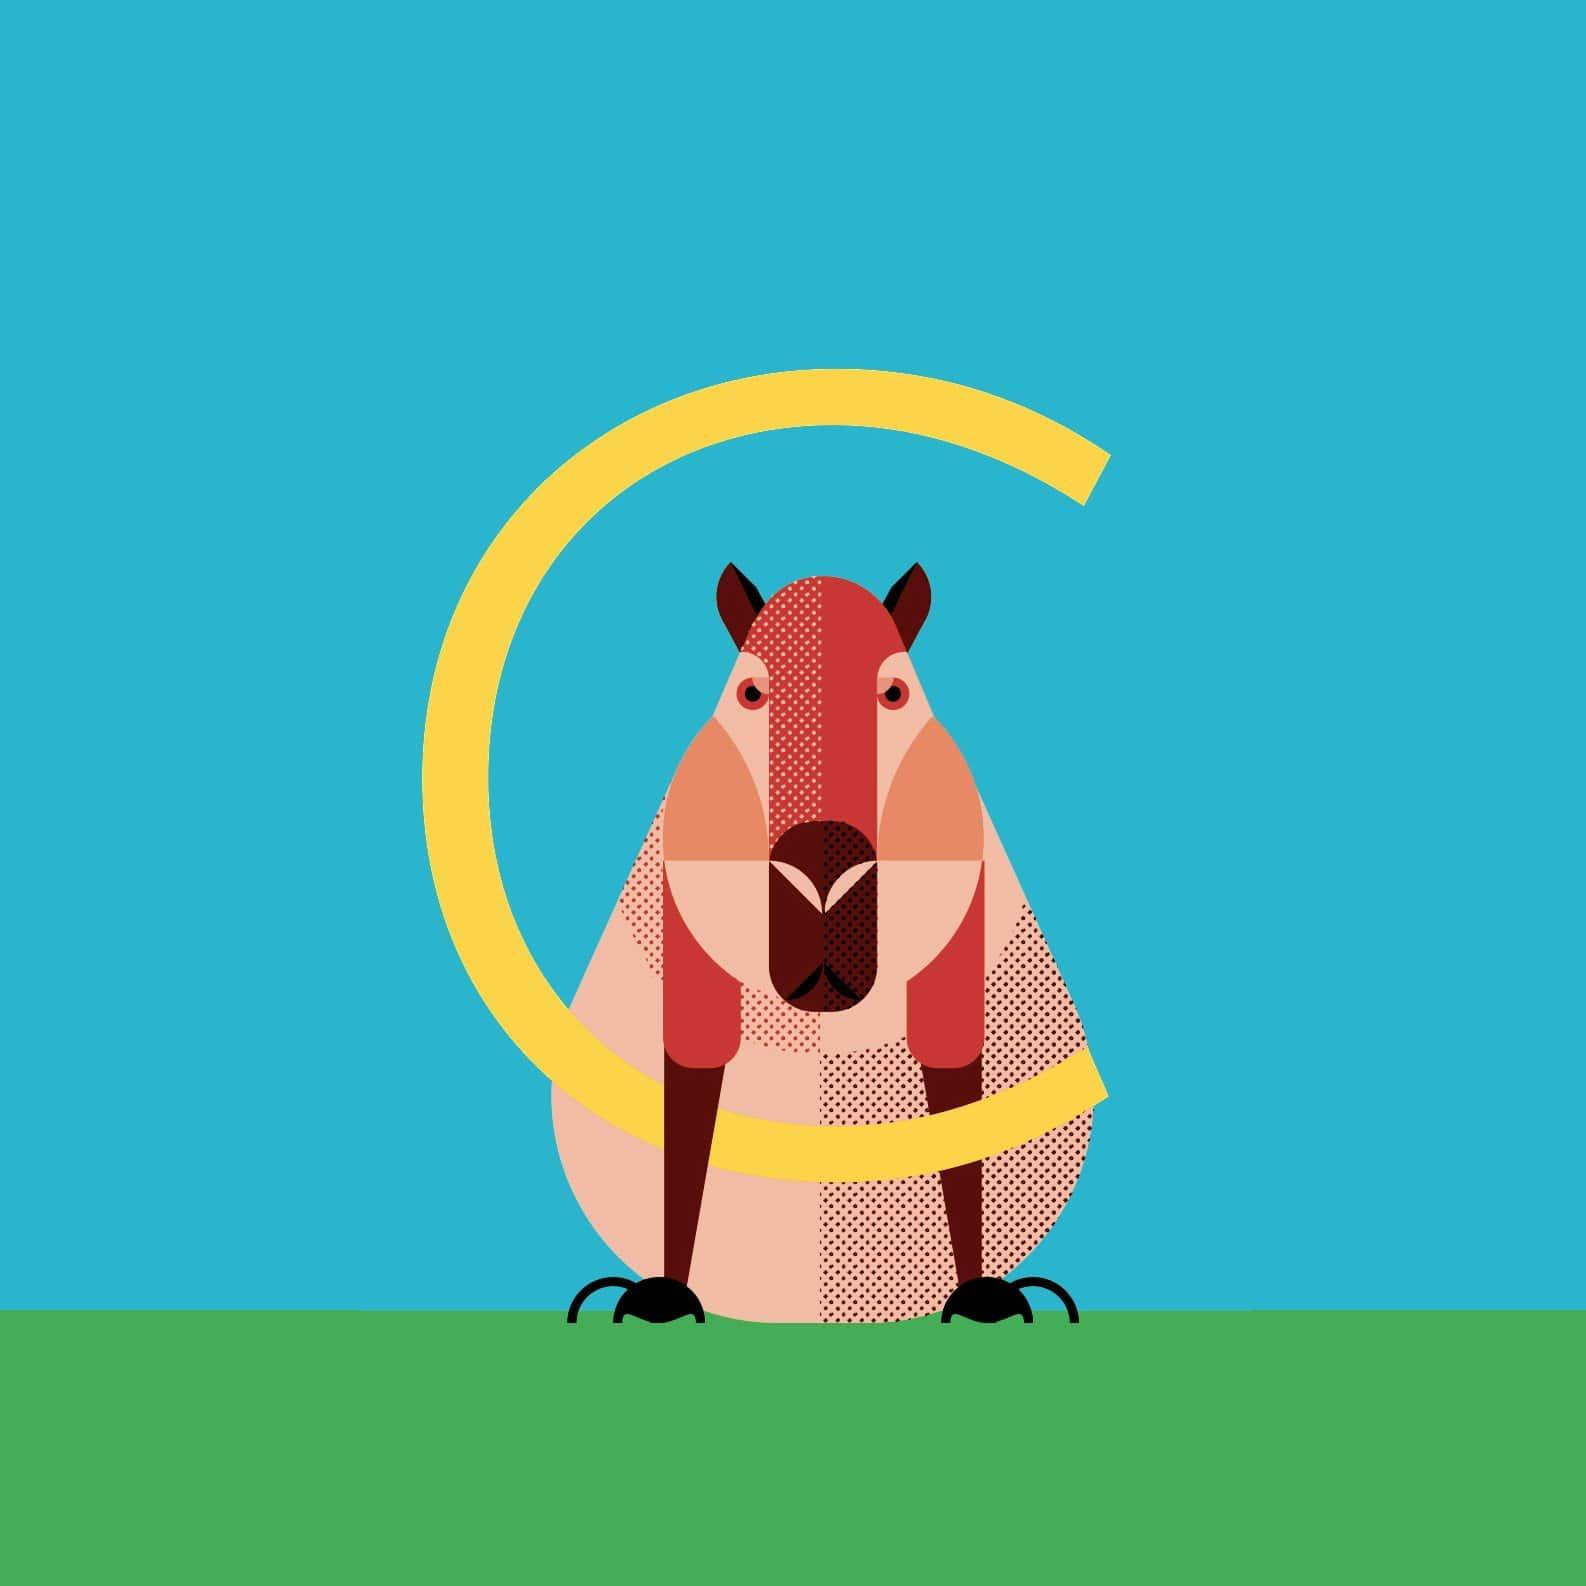 alice-iuri-poster-animal-capibara-illustration